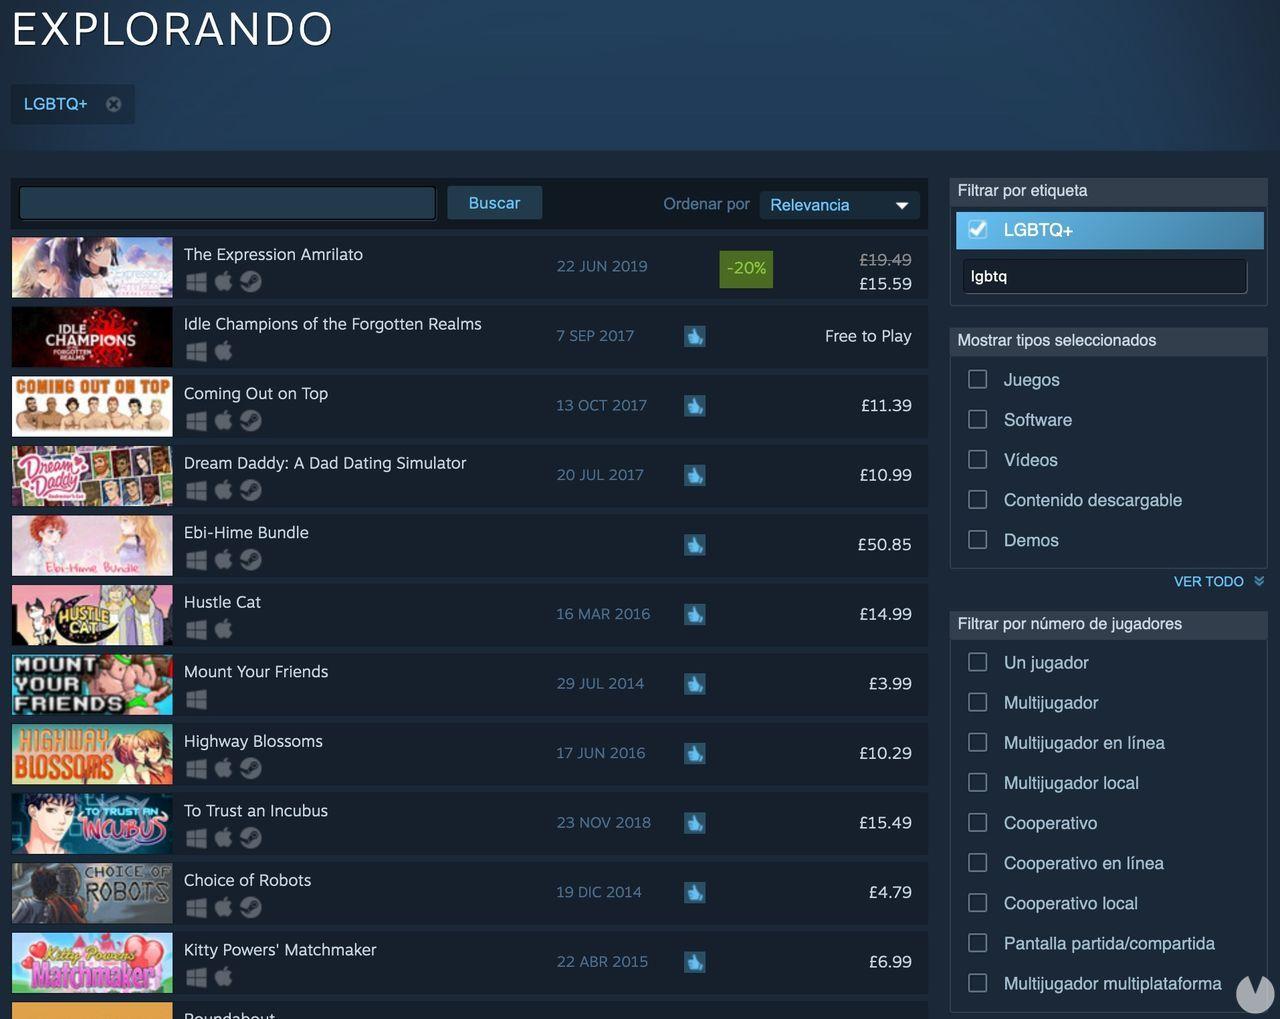 Steam introduces an official label LGTBQ+